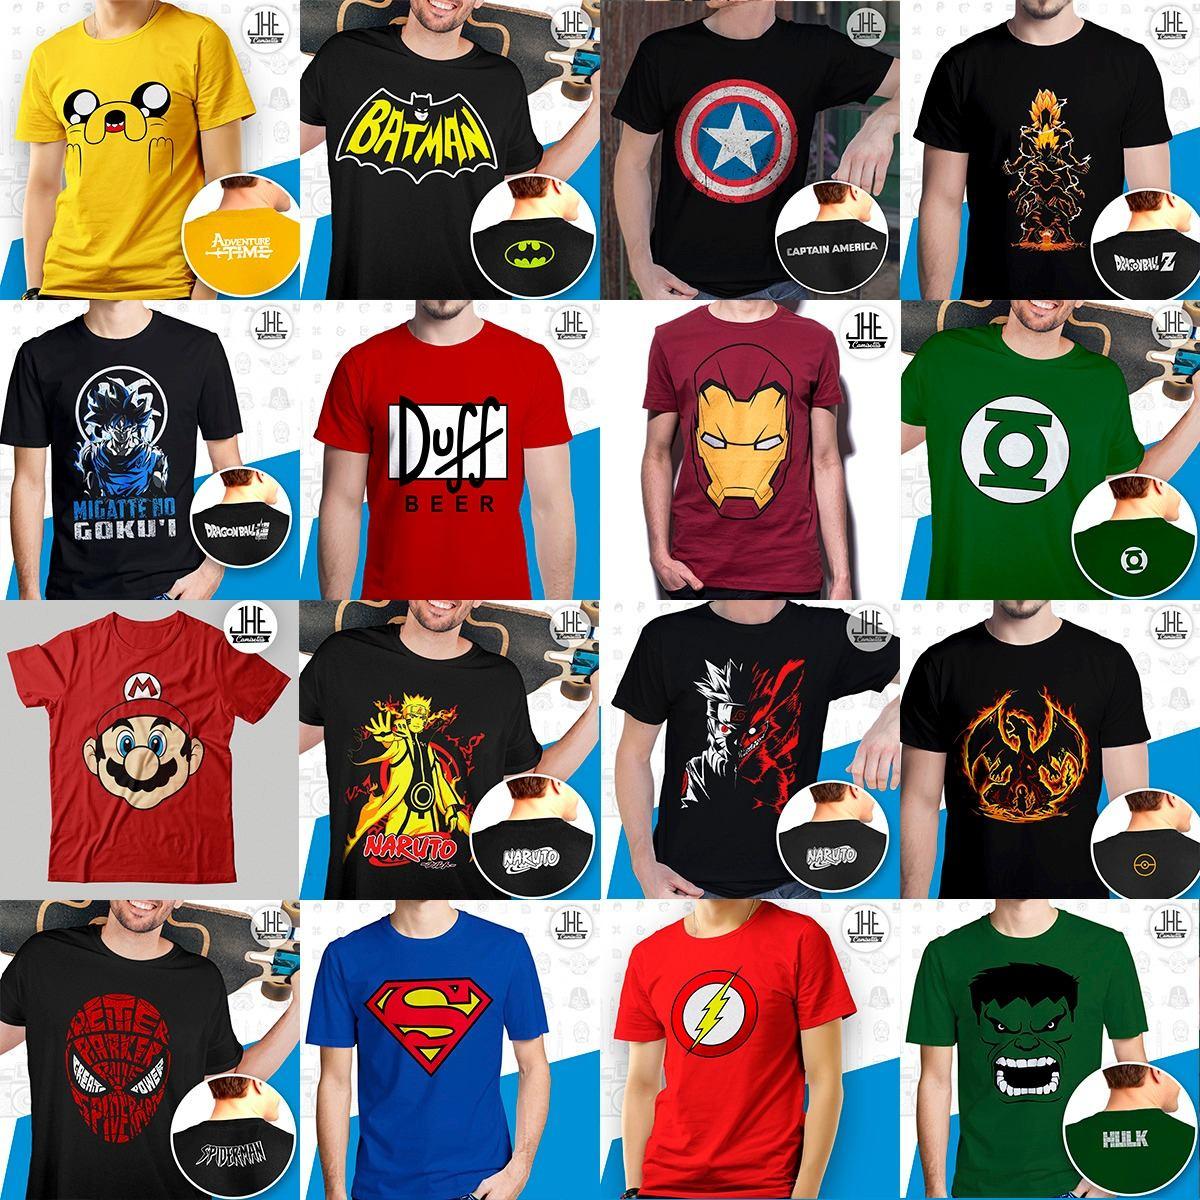 a51bd7aaf9 kit 10 camisetas animes banda de rock séries atacado revenda. Carregando  zoom.